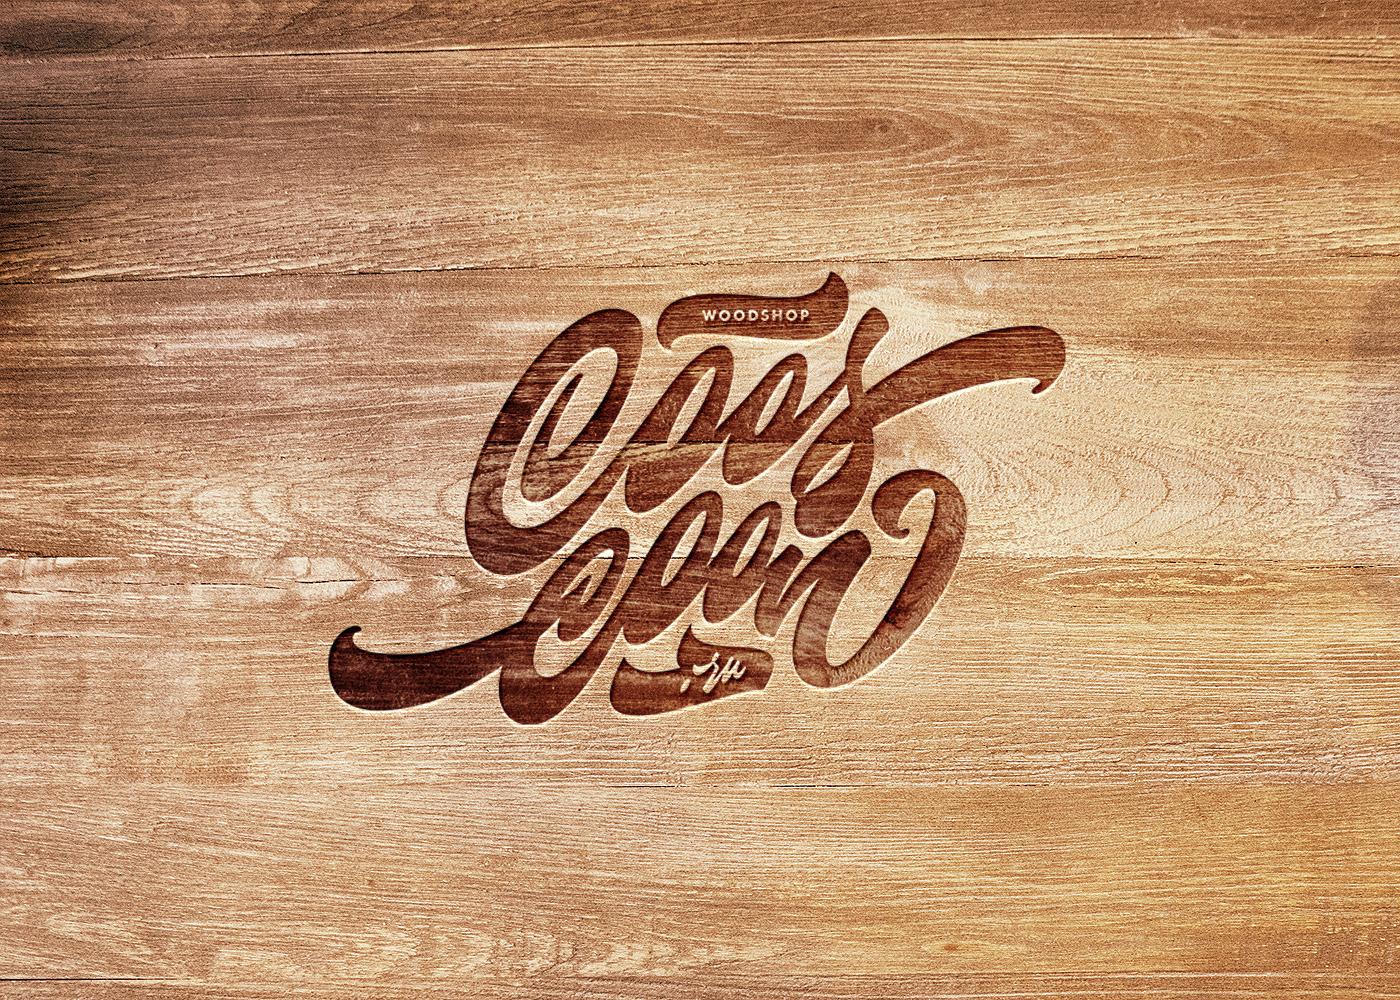 lettering hand-lettered logo logo Logotype woodshop Woodcraft hand-lettering